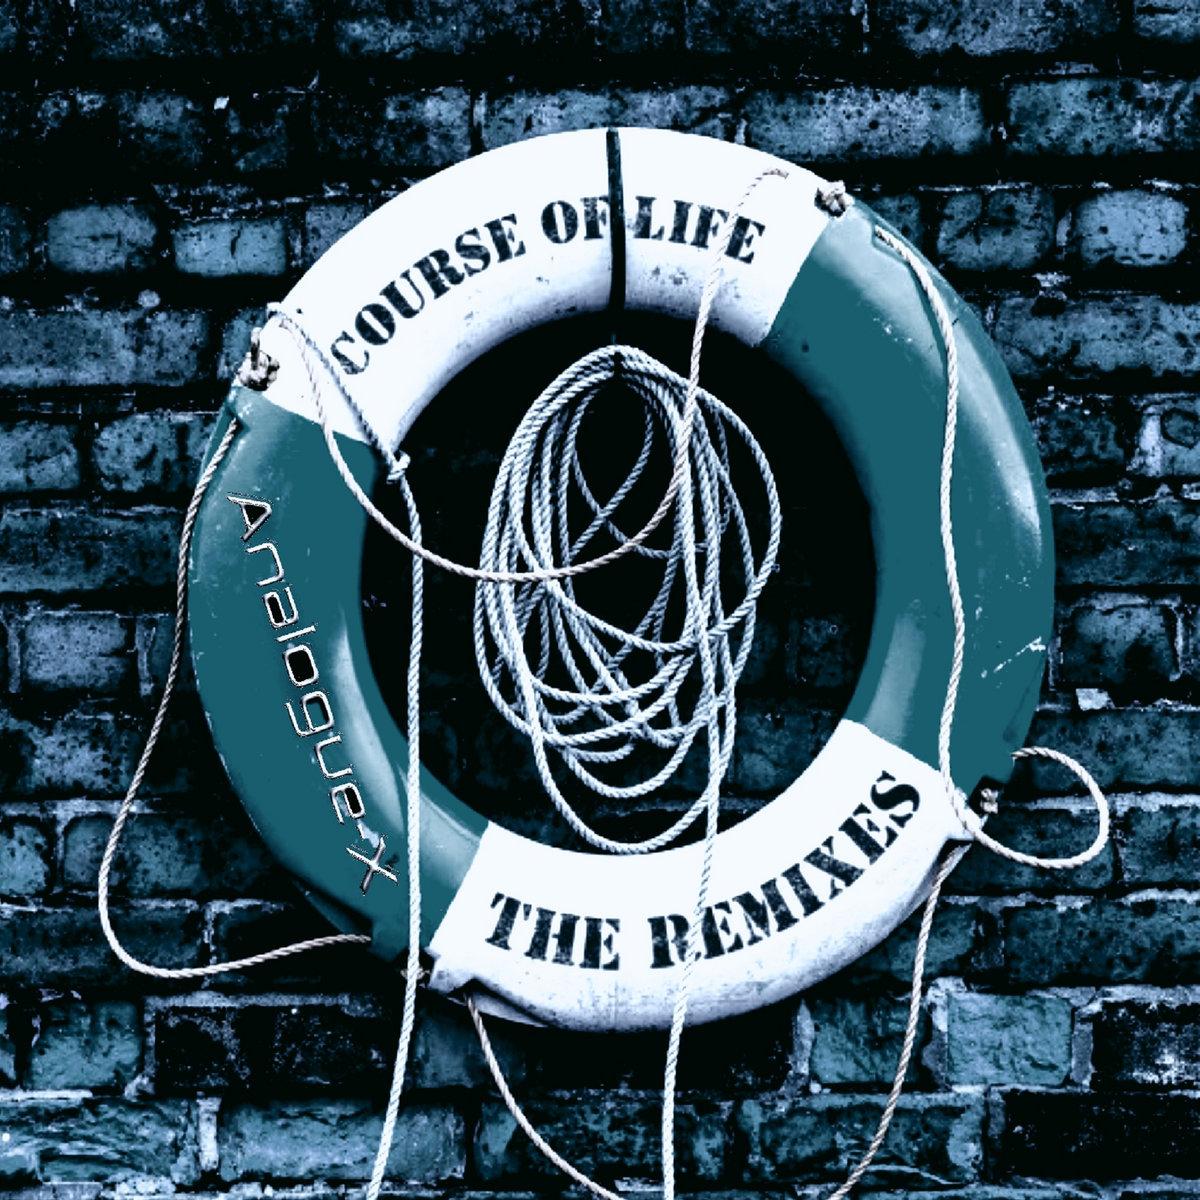 Course of Life - The Remixes | Analogue-X